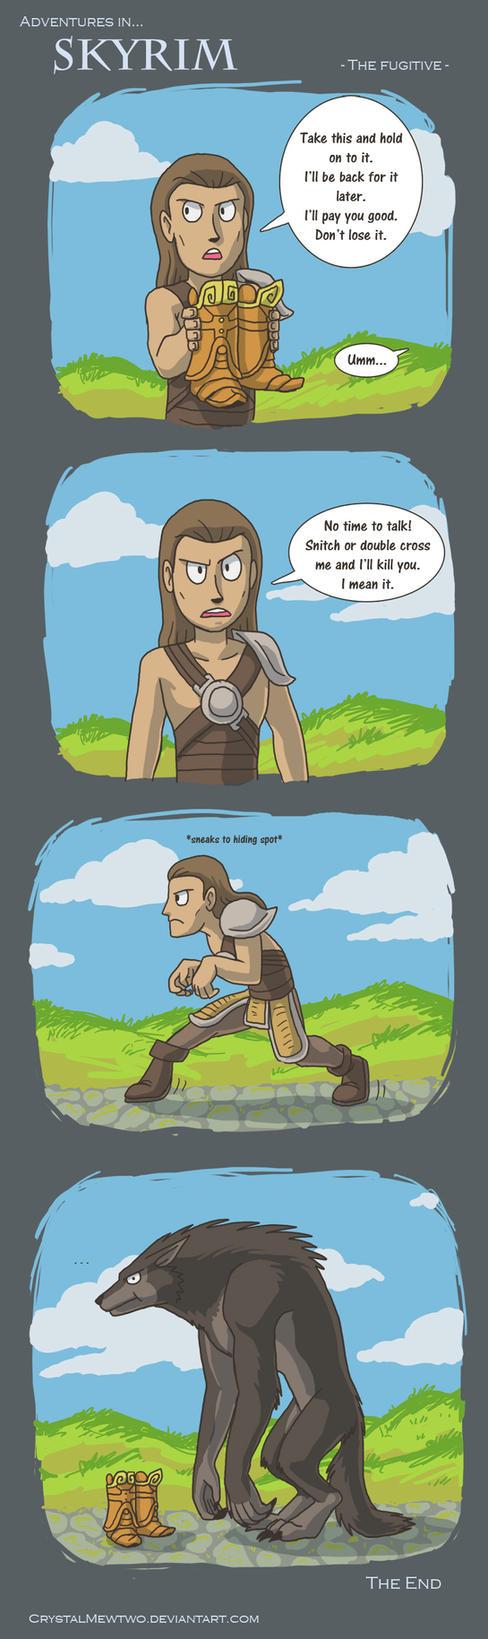 Skyrim - The fugitive by FoolishLittleMortal